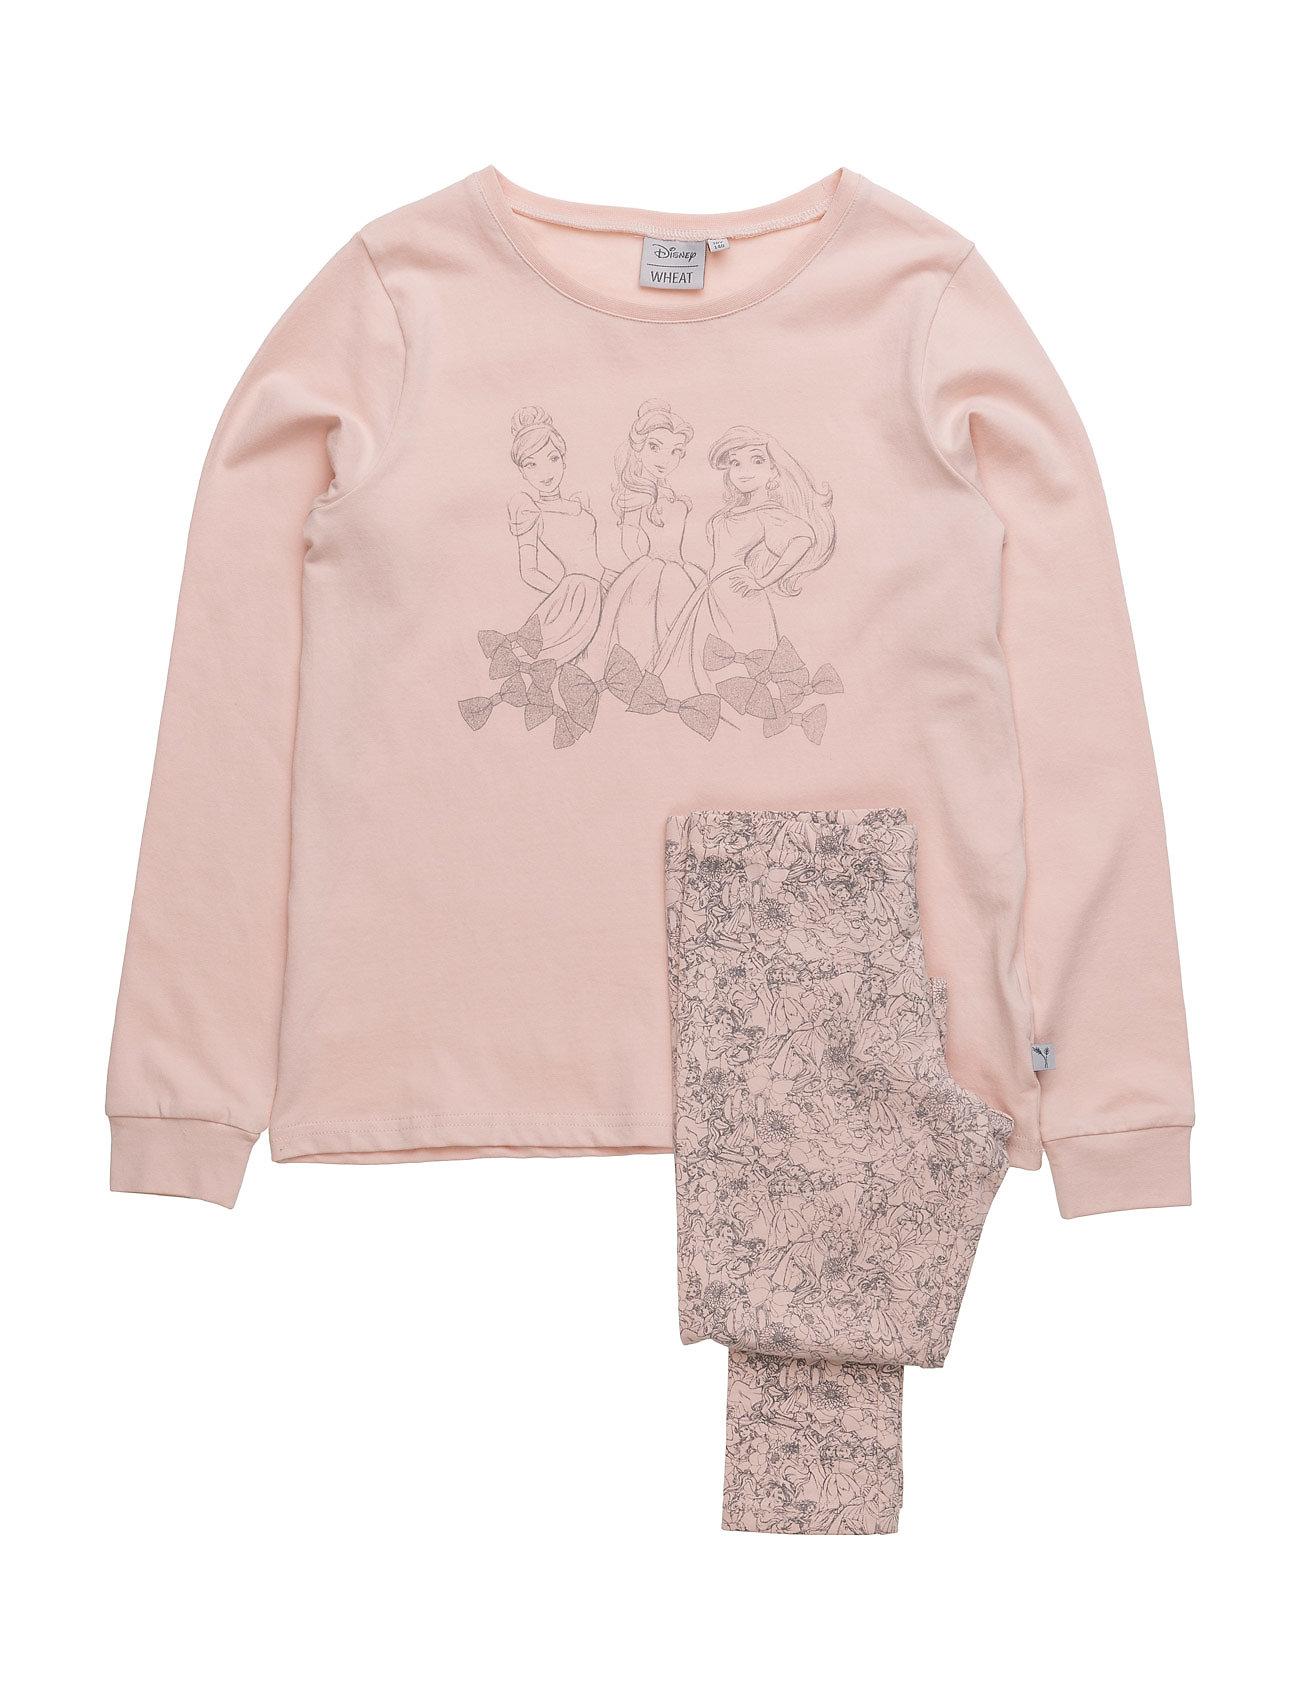 Pyjamas Princess Disney by Wheat Pyjamas til Børn i Pulver